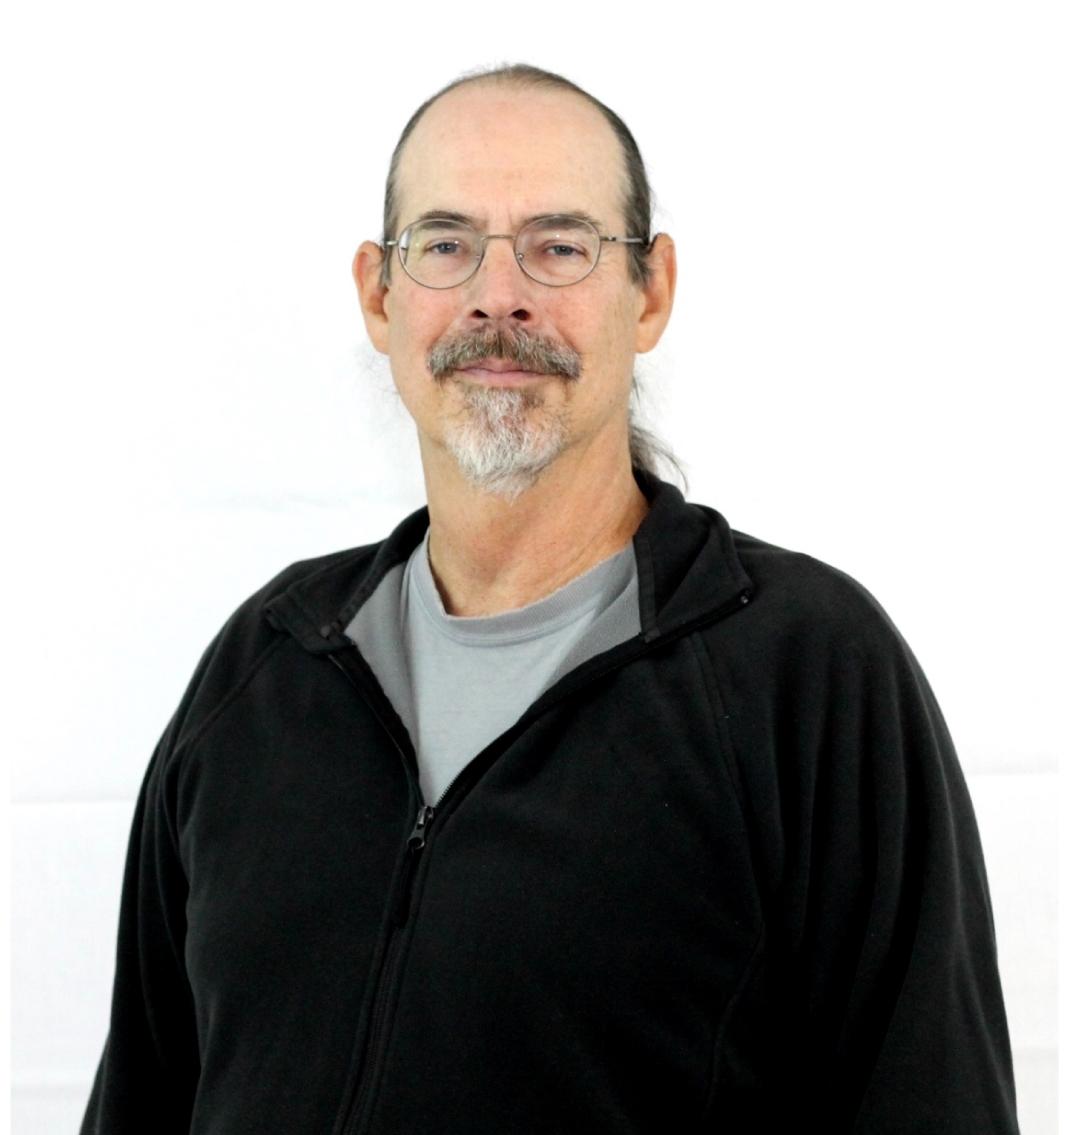 Fred J. Sheil